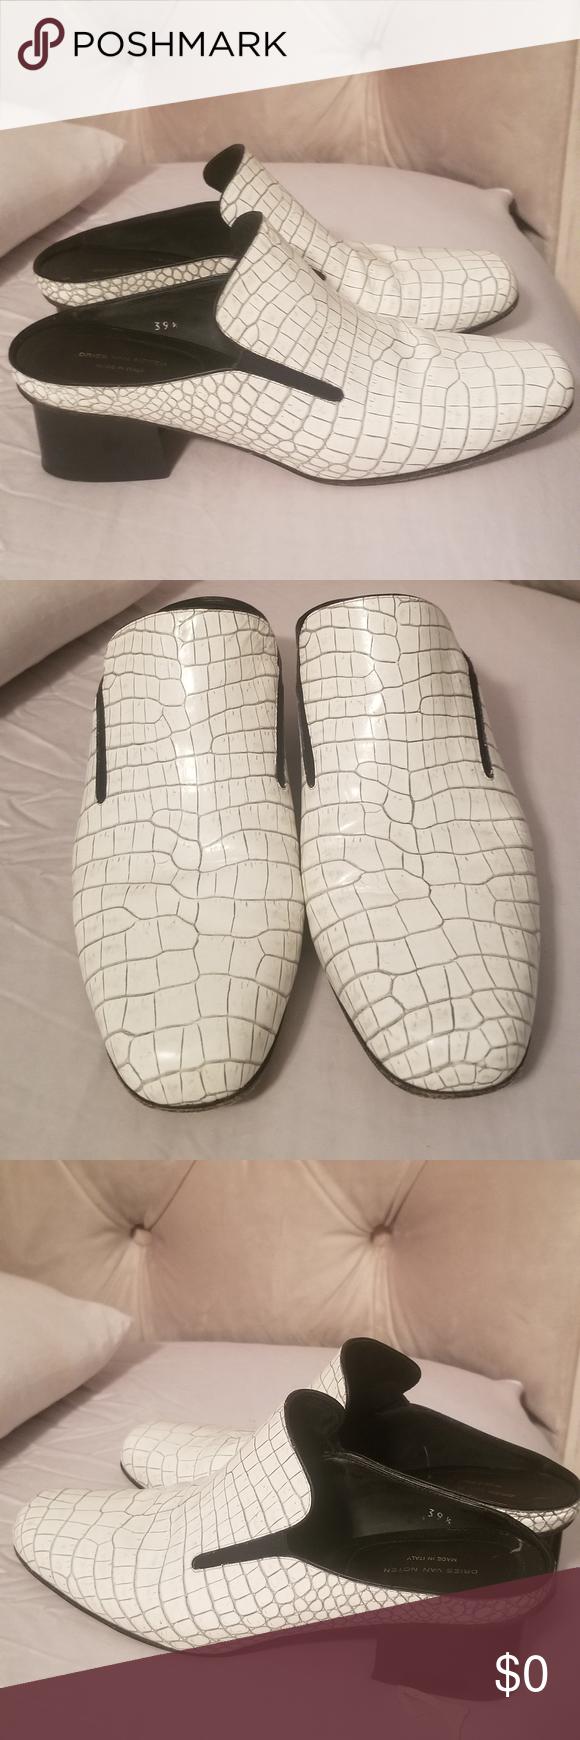 gucci crocs price